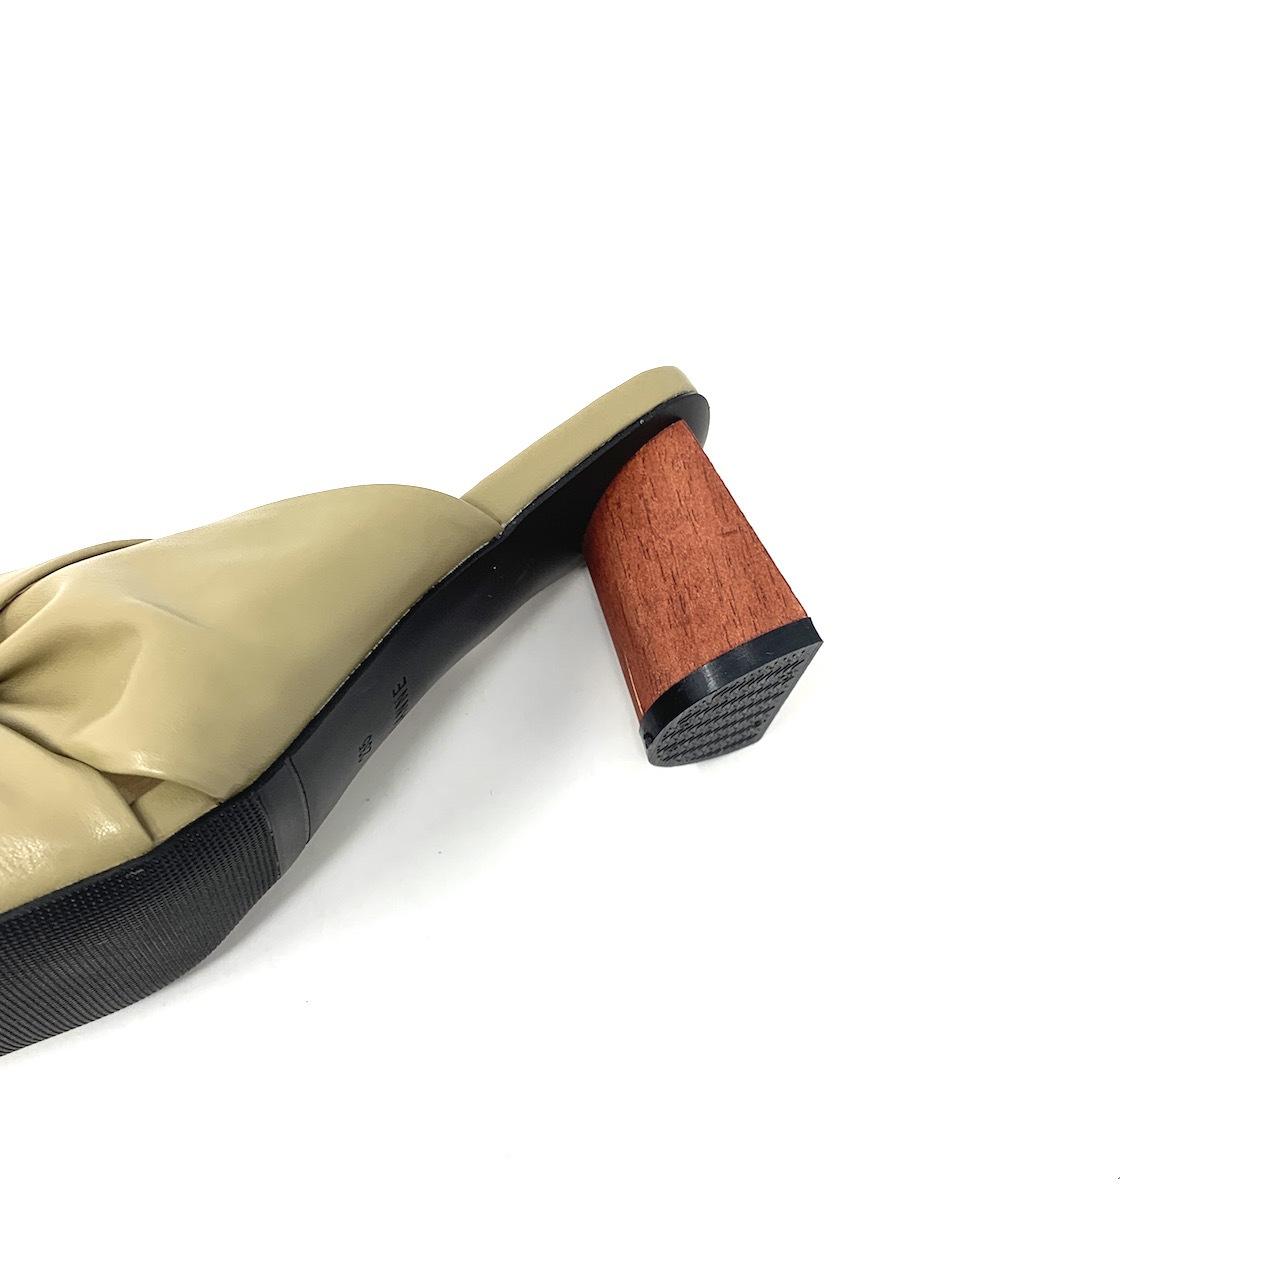 Wood heel Turban sandals   ウッドヒールターバンサンダル #kr0019